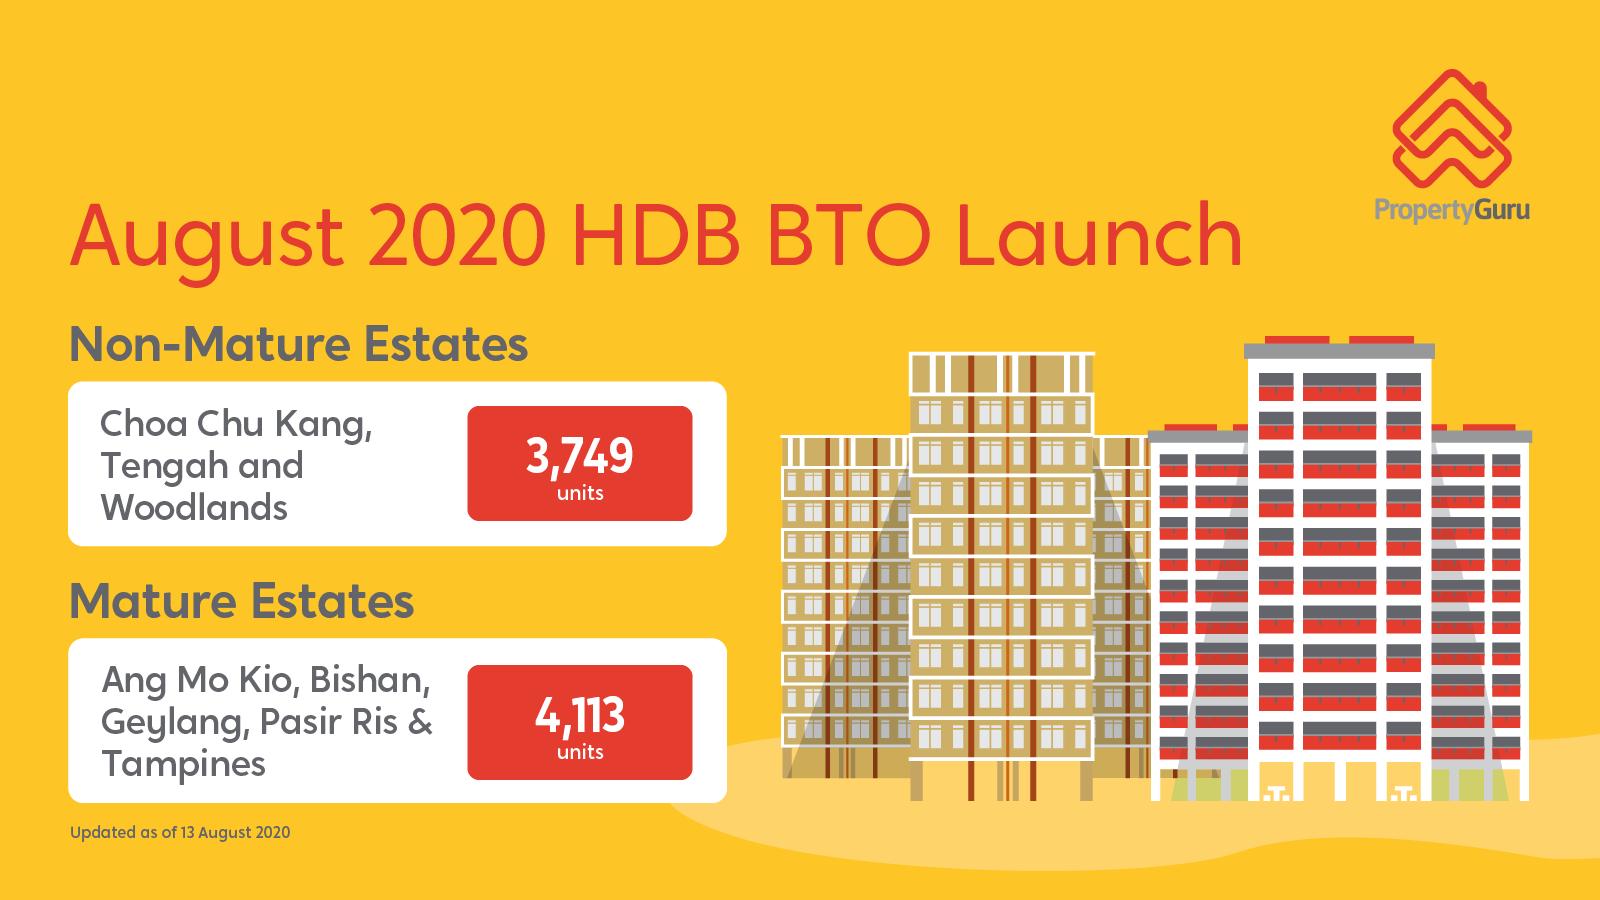 hdb bto launch in august 2020